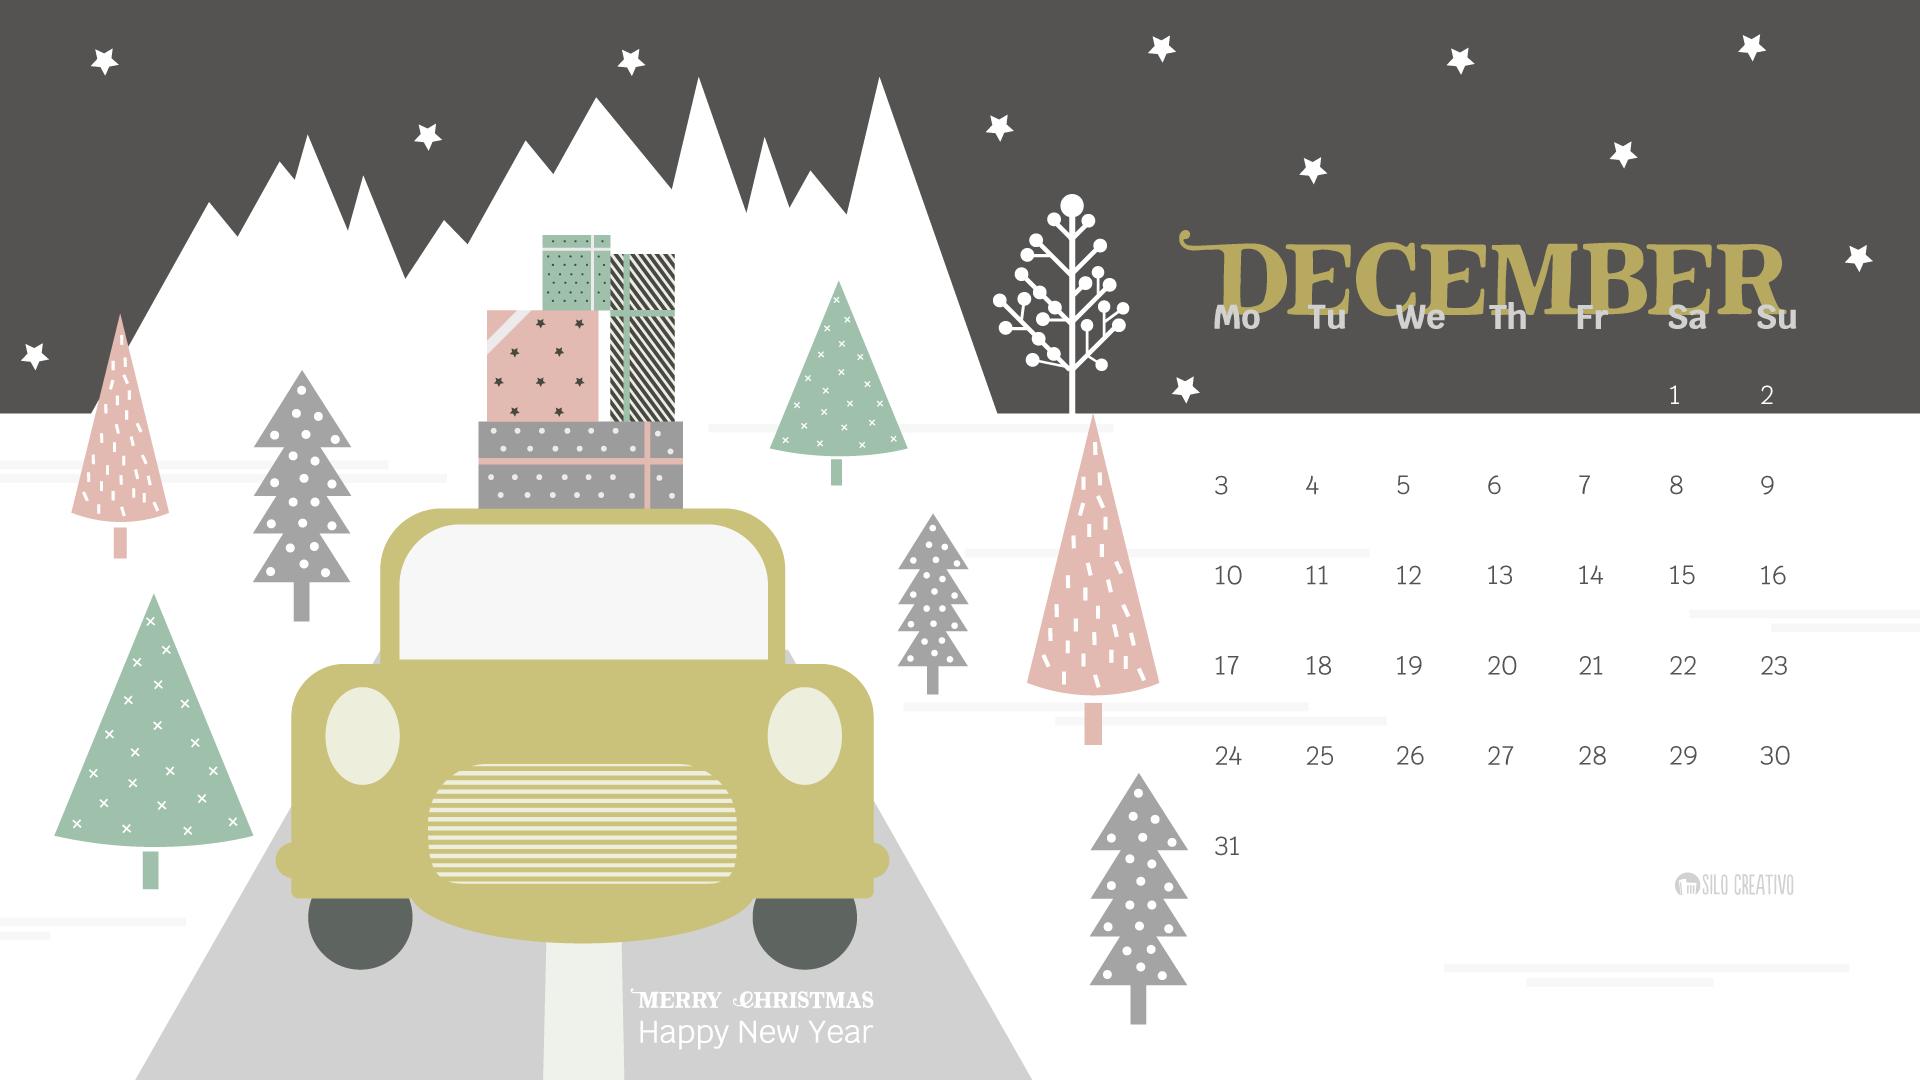 December Laptop Calendar 2019 Wallpaper Downloadable Calendar: December 2018 • Silo Creativo